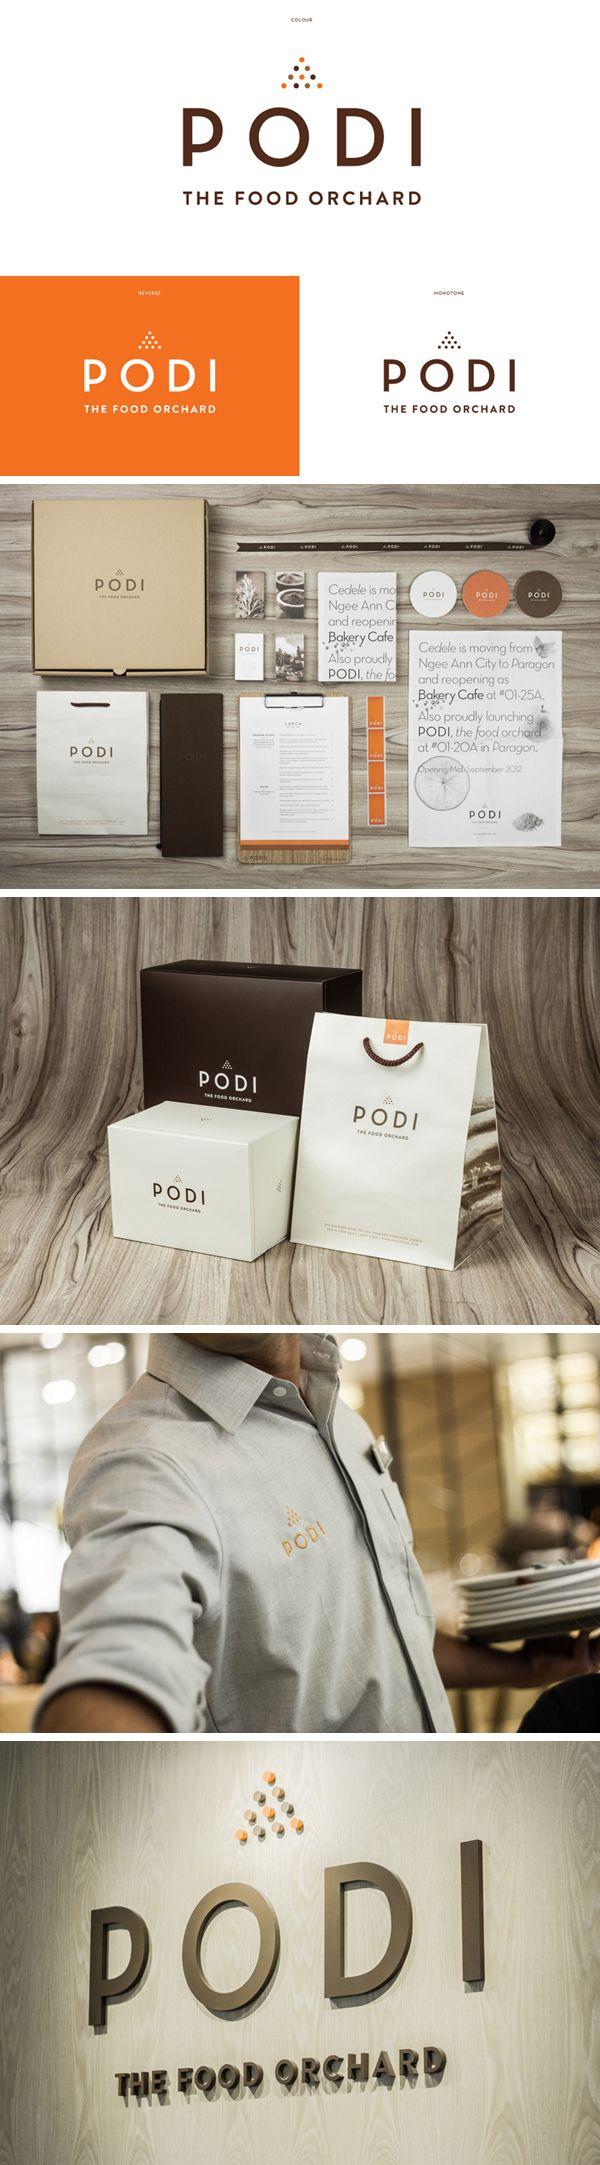 identity / Podi restaurant | #stationary #corporate #design #corporatedesign #identity #branding #marketing < repinned by www.BlickeDeeler.de | Take a look at www.LogoGestaltung-Hamburg.de